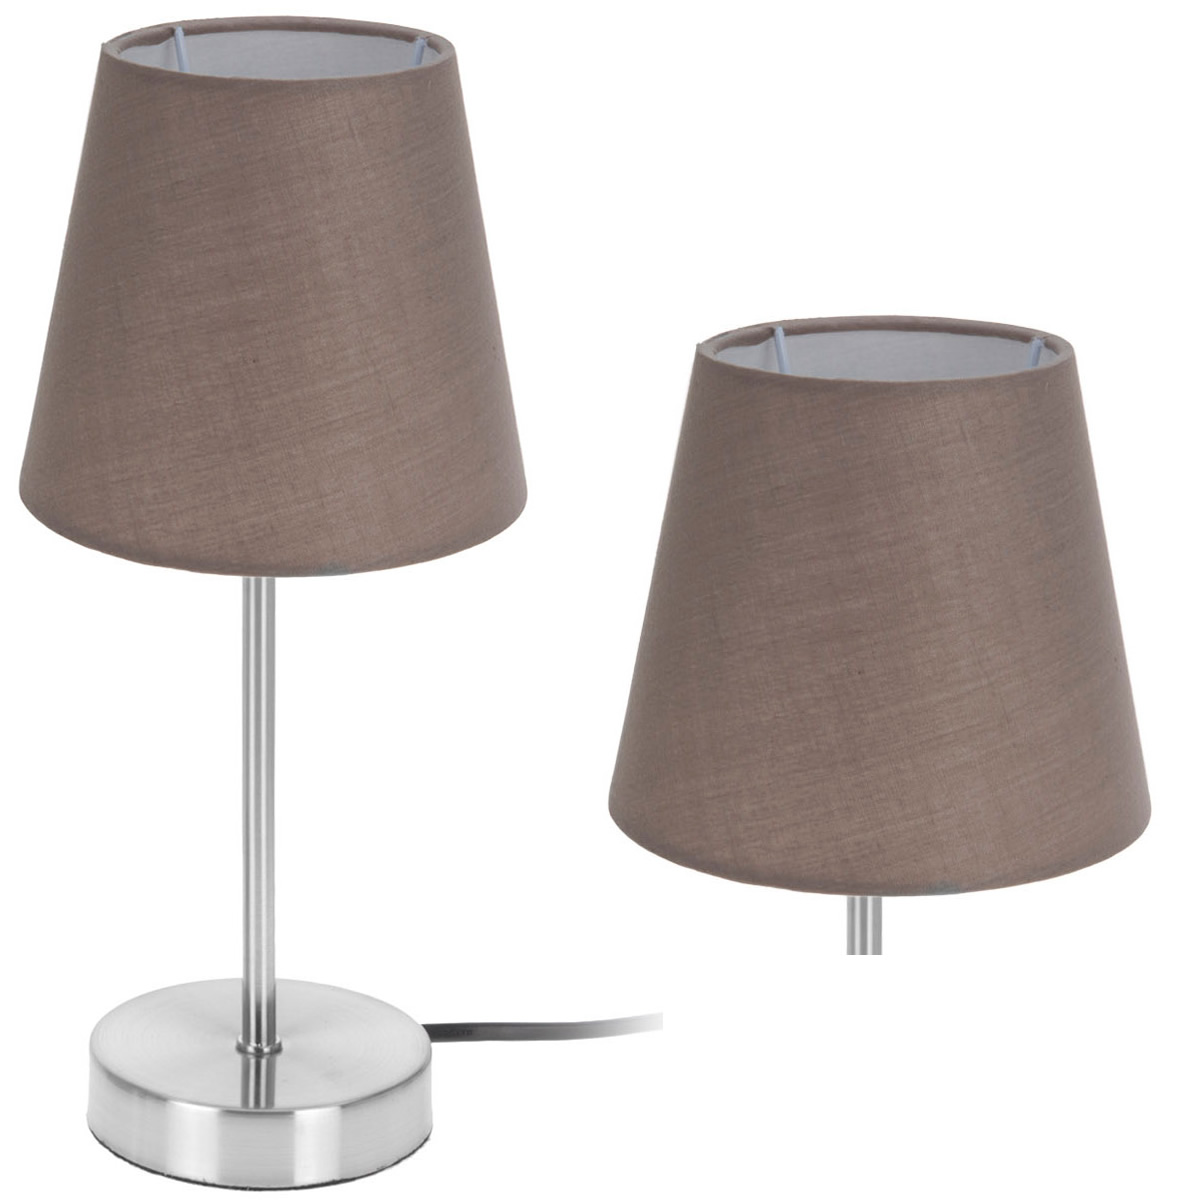 design tischleuchte tischlampe b roleuchte. Black Bedroom Furniture Sets. Home Design Ideas